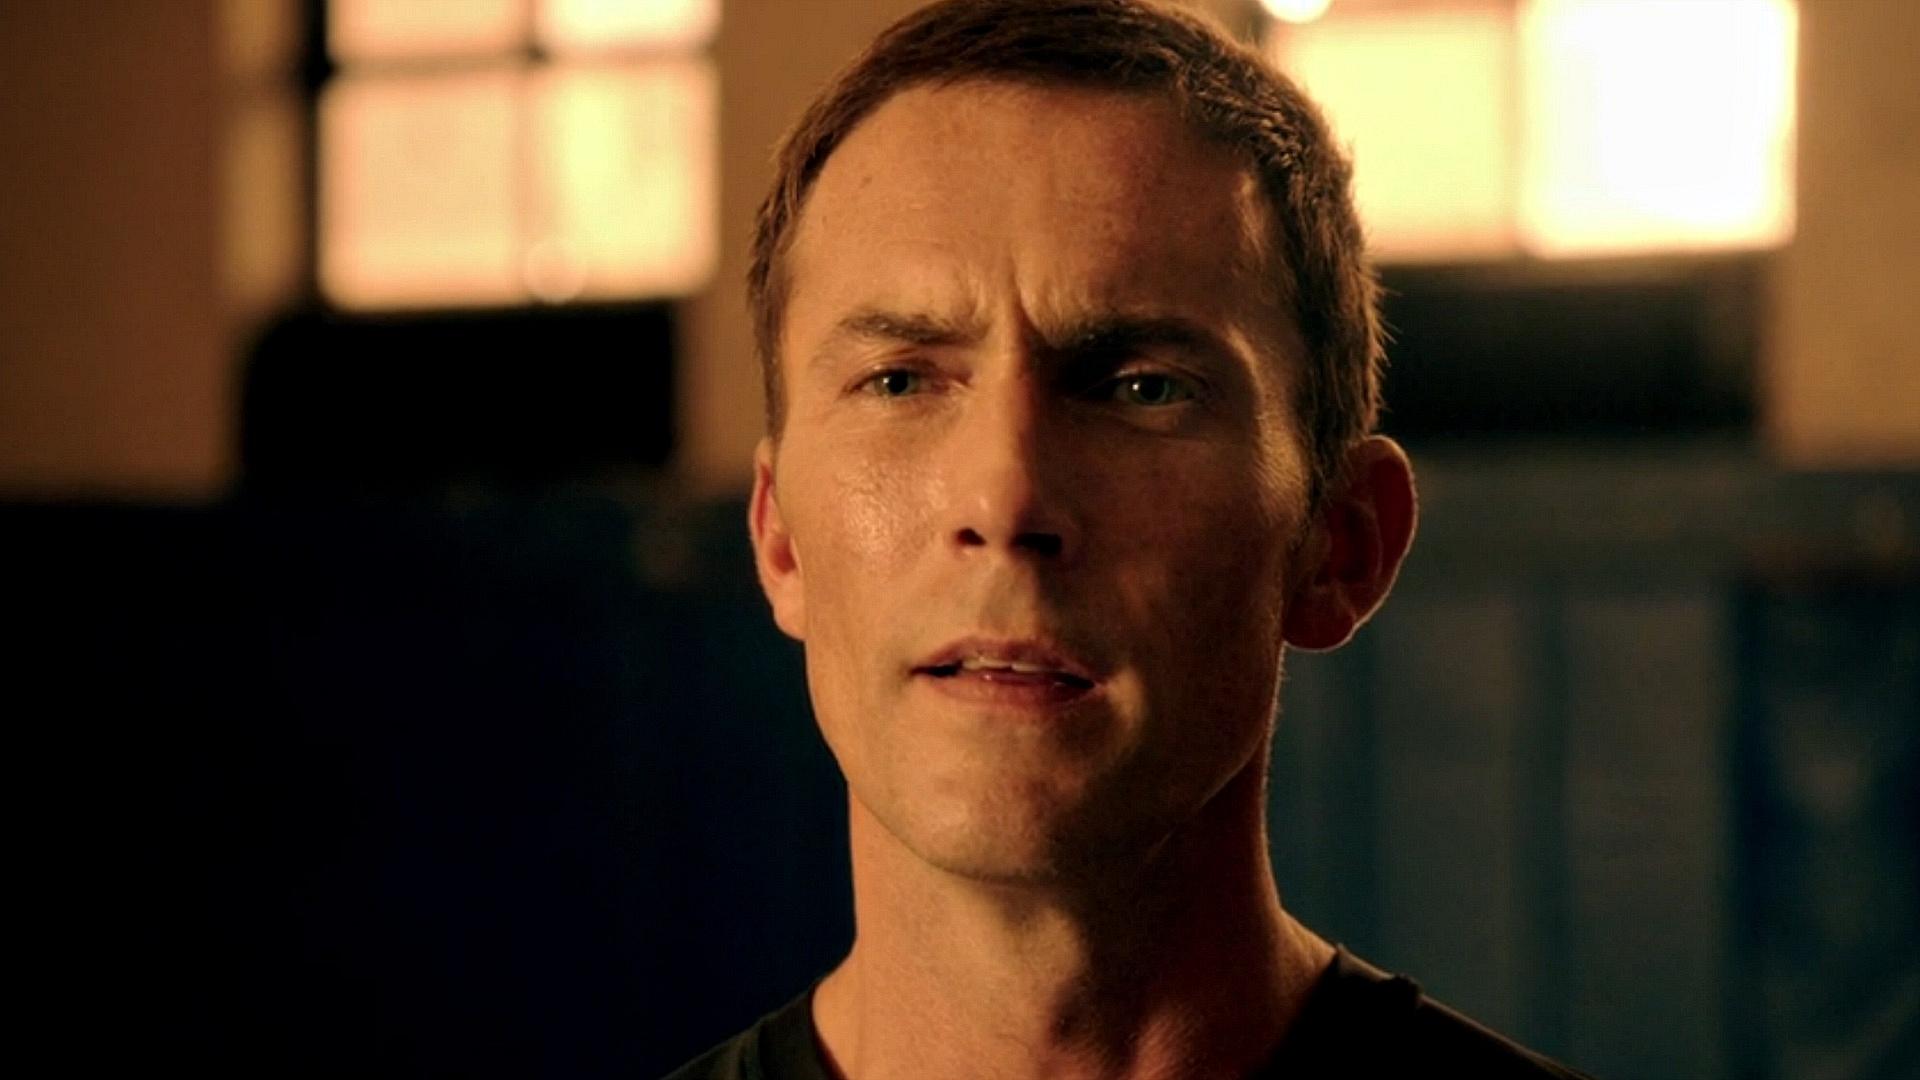 Desmond Harrington as Agent Casey Rooks